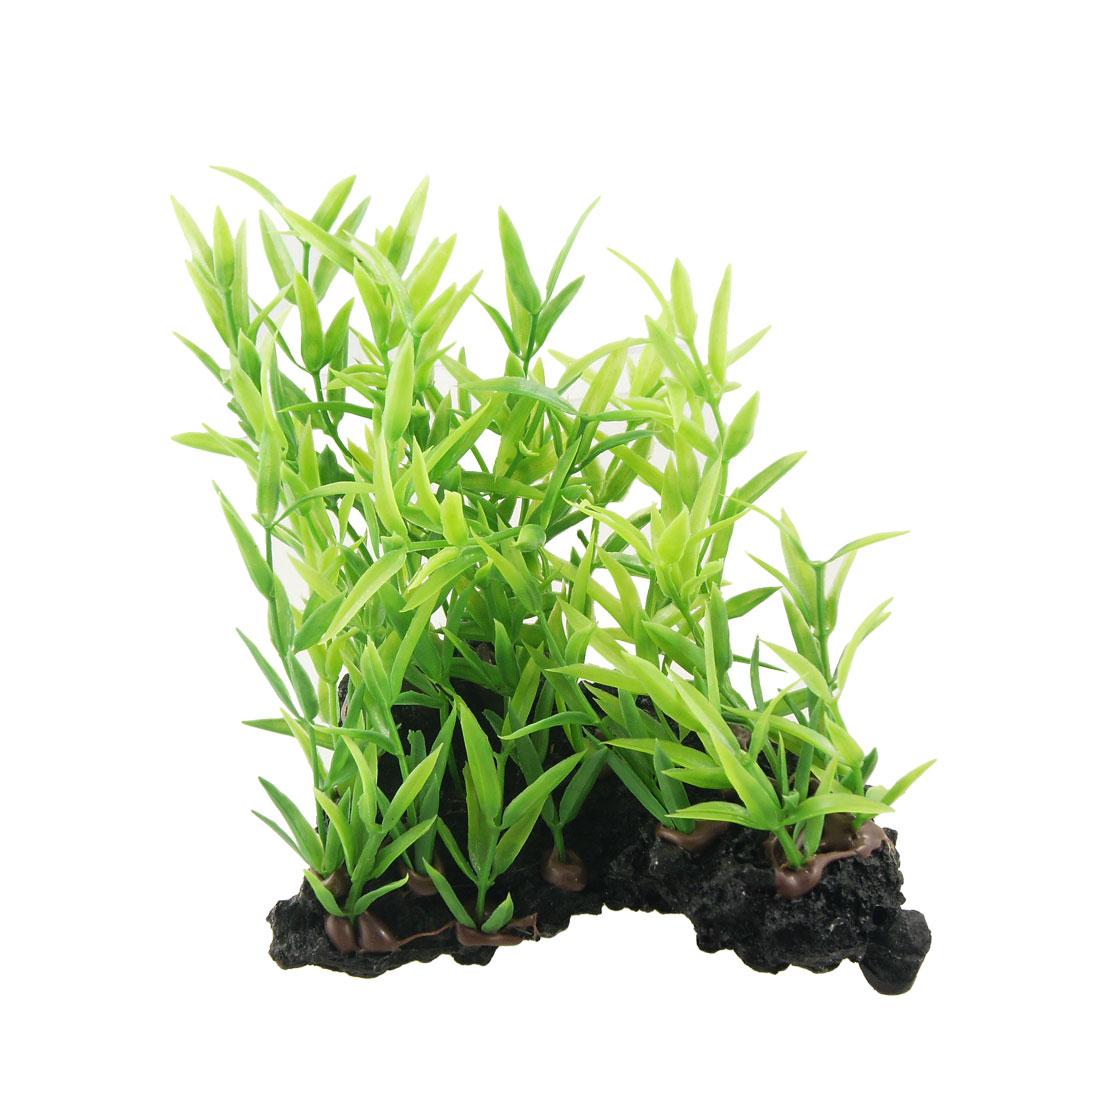 "Green Narrow Leaves 6.7"" High Plastic Plant Decoration for Aquarium"